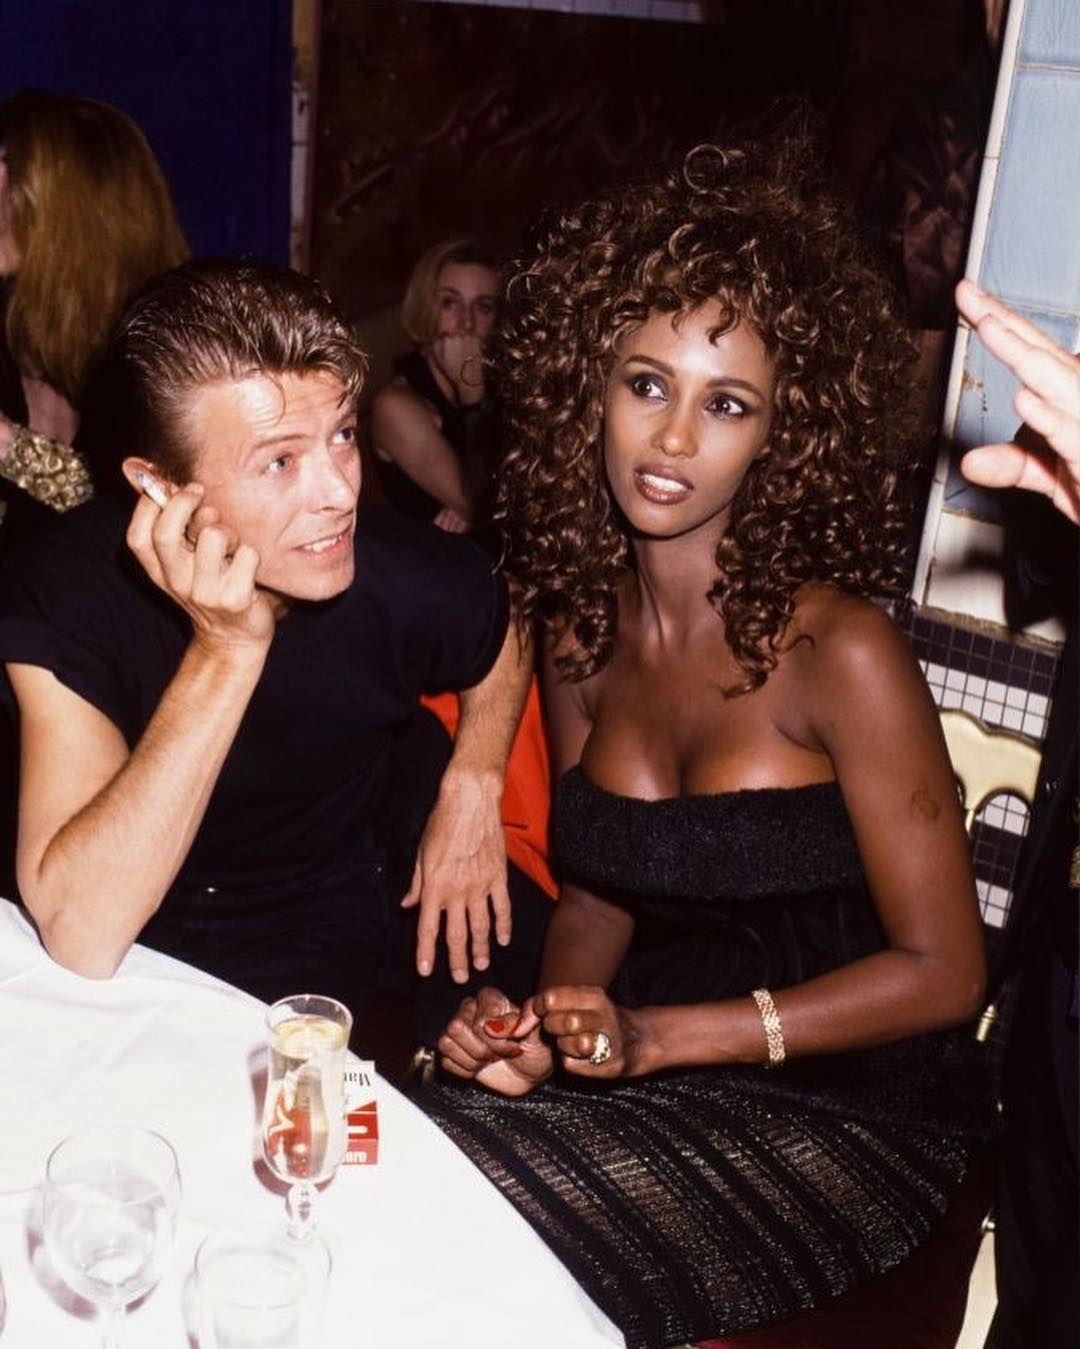 Music Monkeys On Instagram Classy Iman And David Bowie David Bowie Starman Iman Bowie